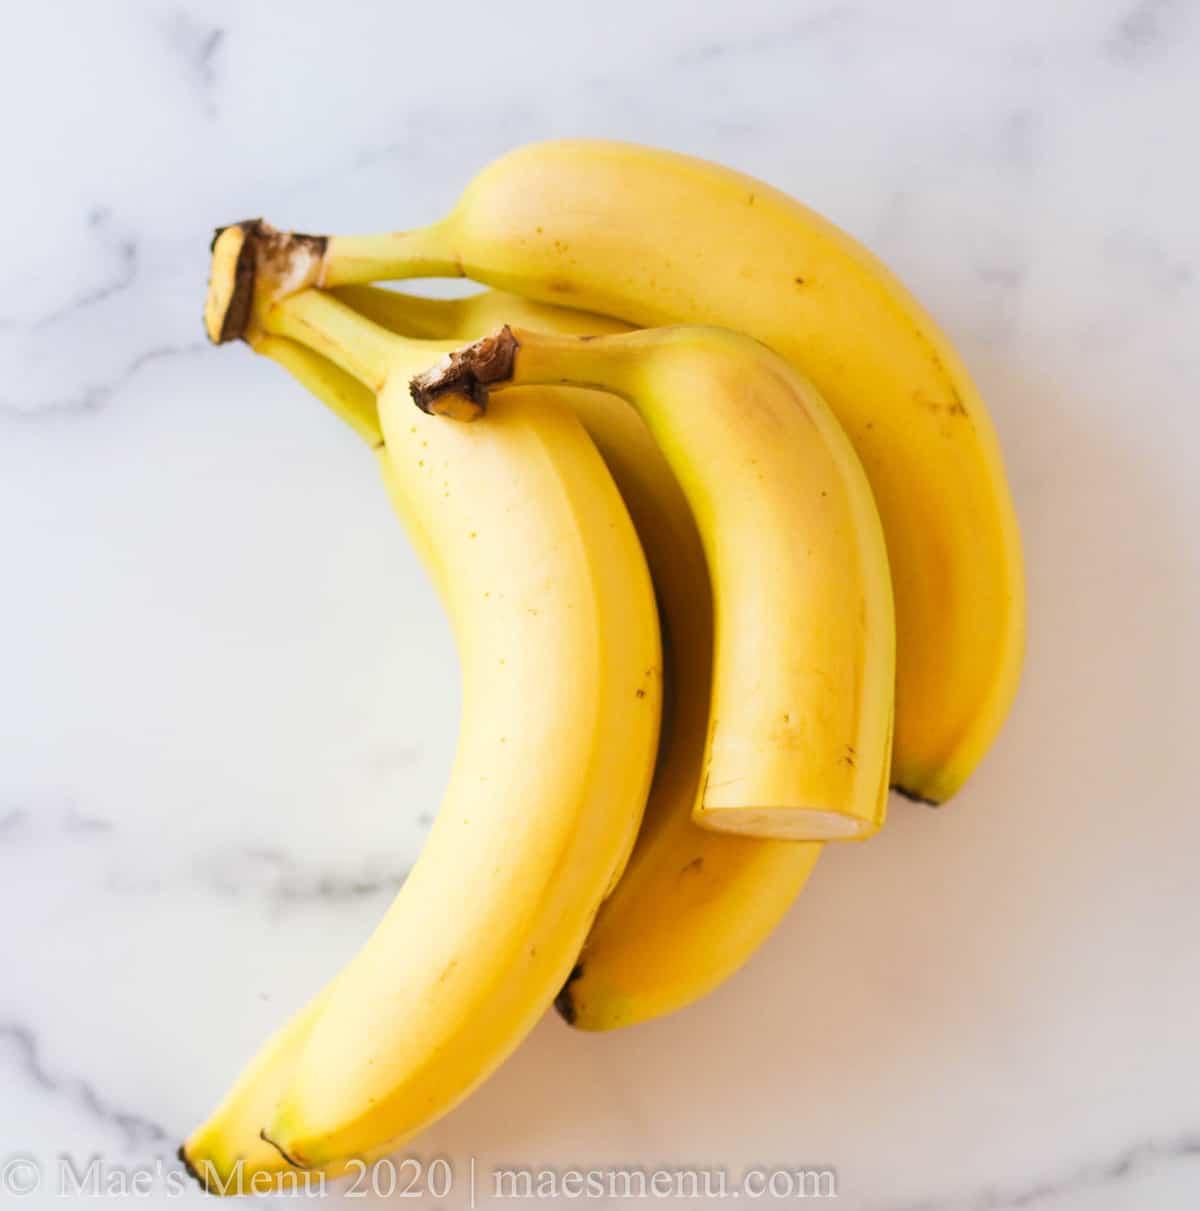 4 1/2 large yellow bananas